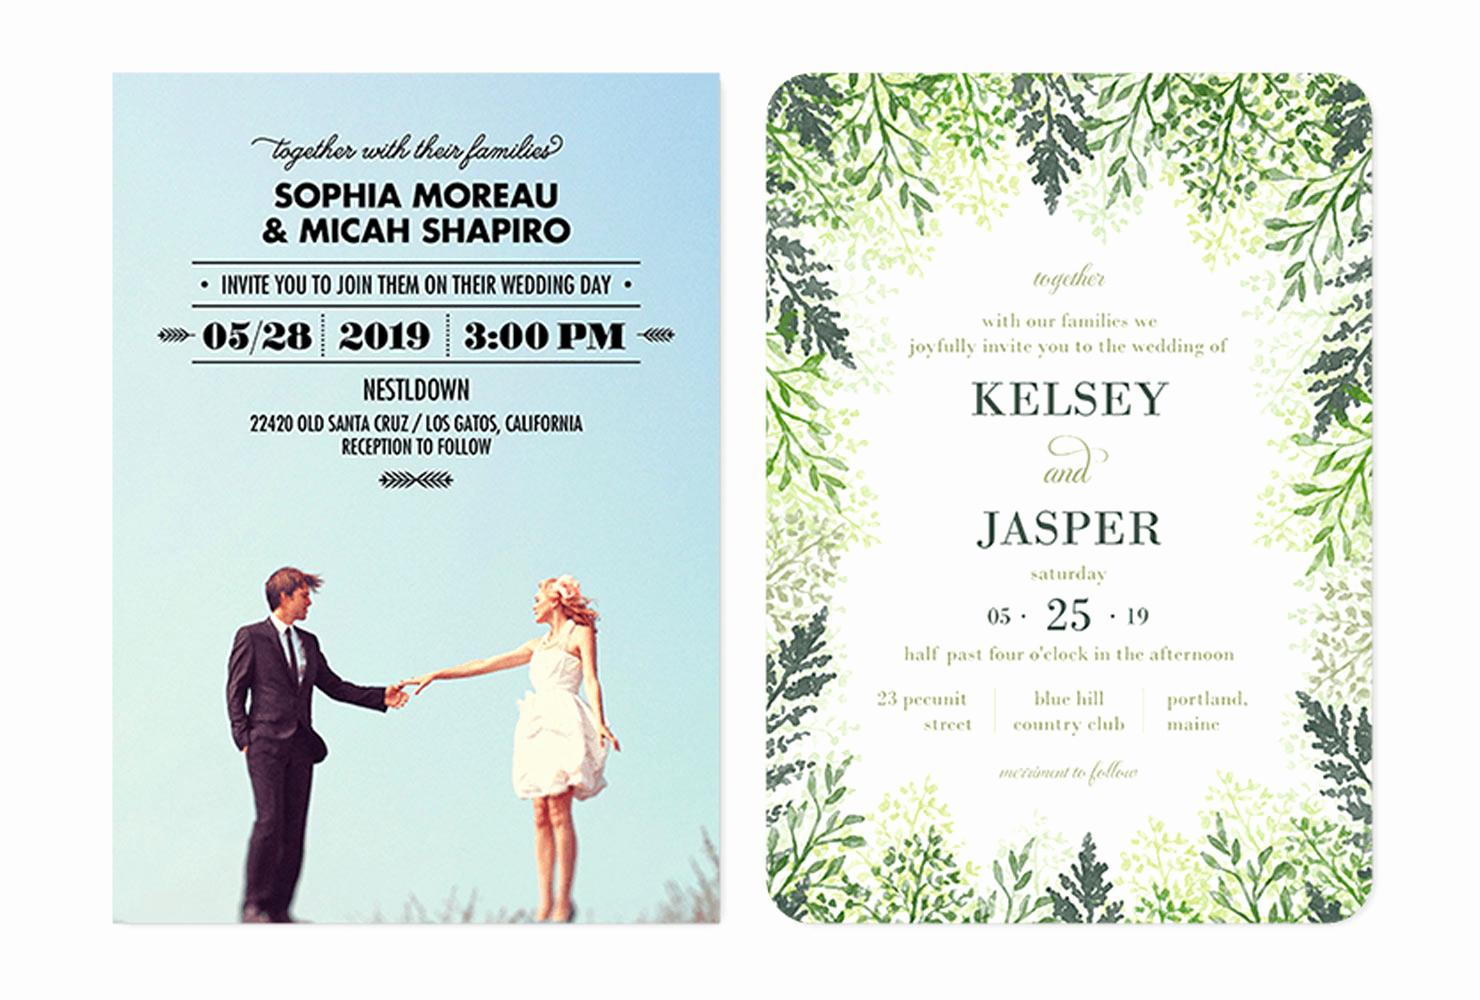 Wedding Invitation Wording Couple Hosting Lovely 35 Wedding Invitation Wording Examples 2019